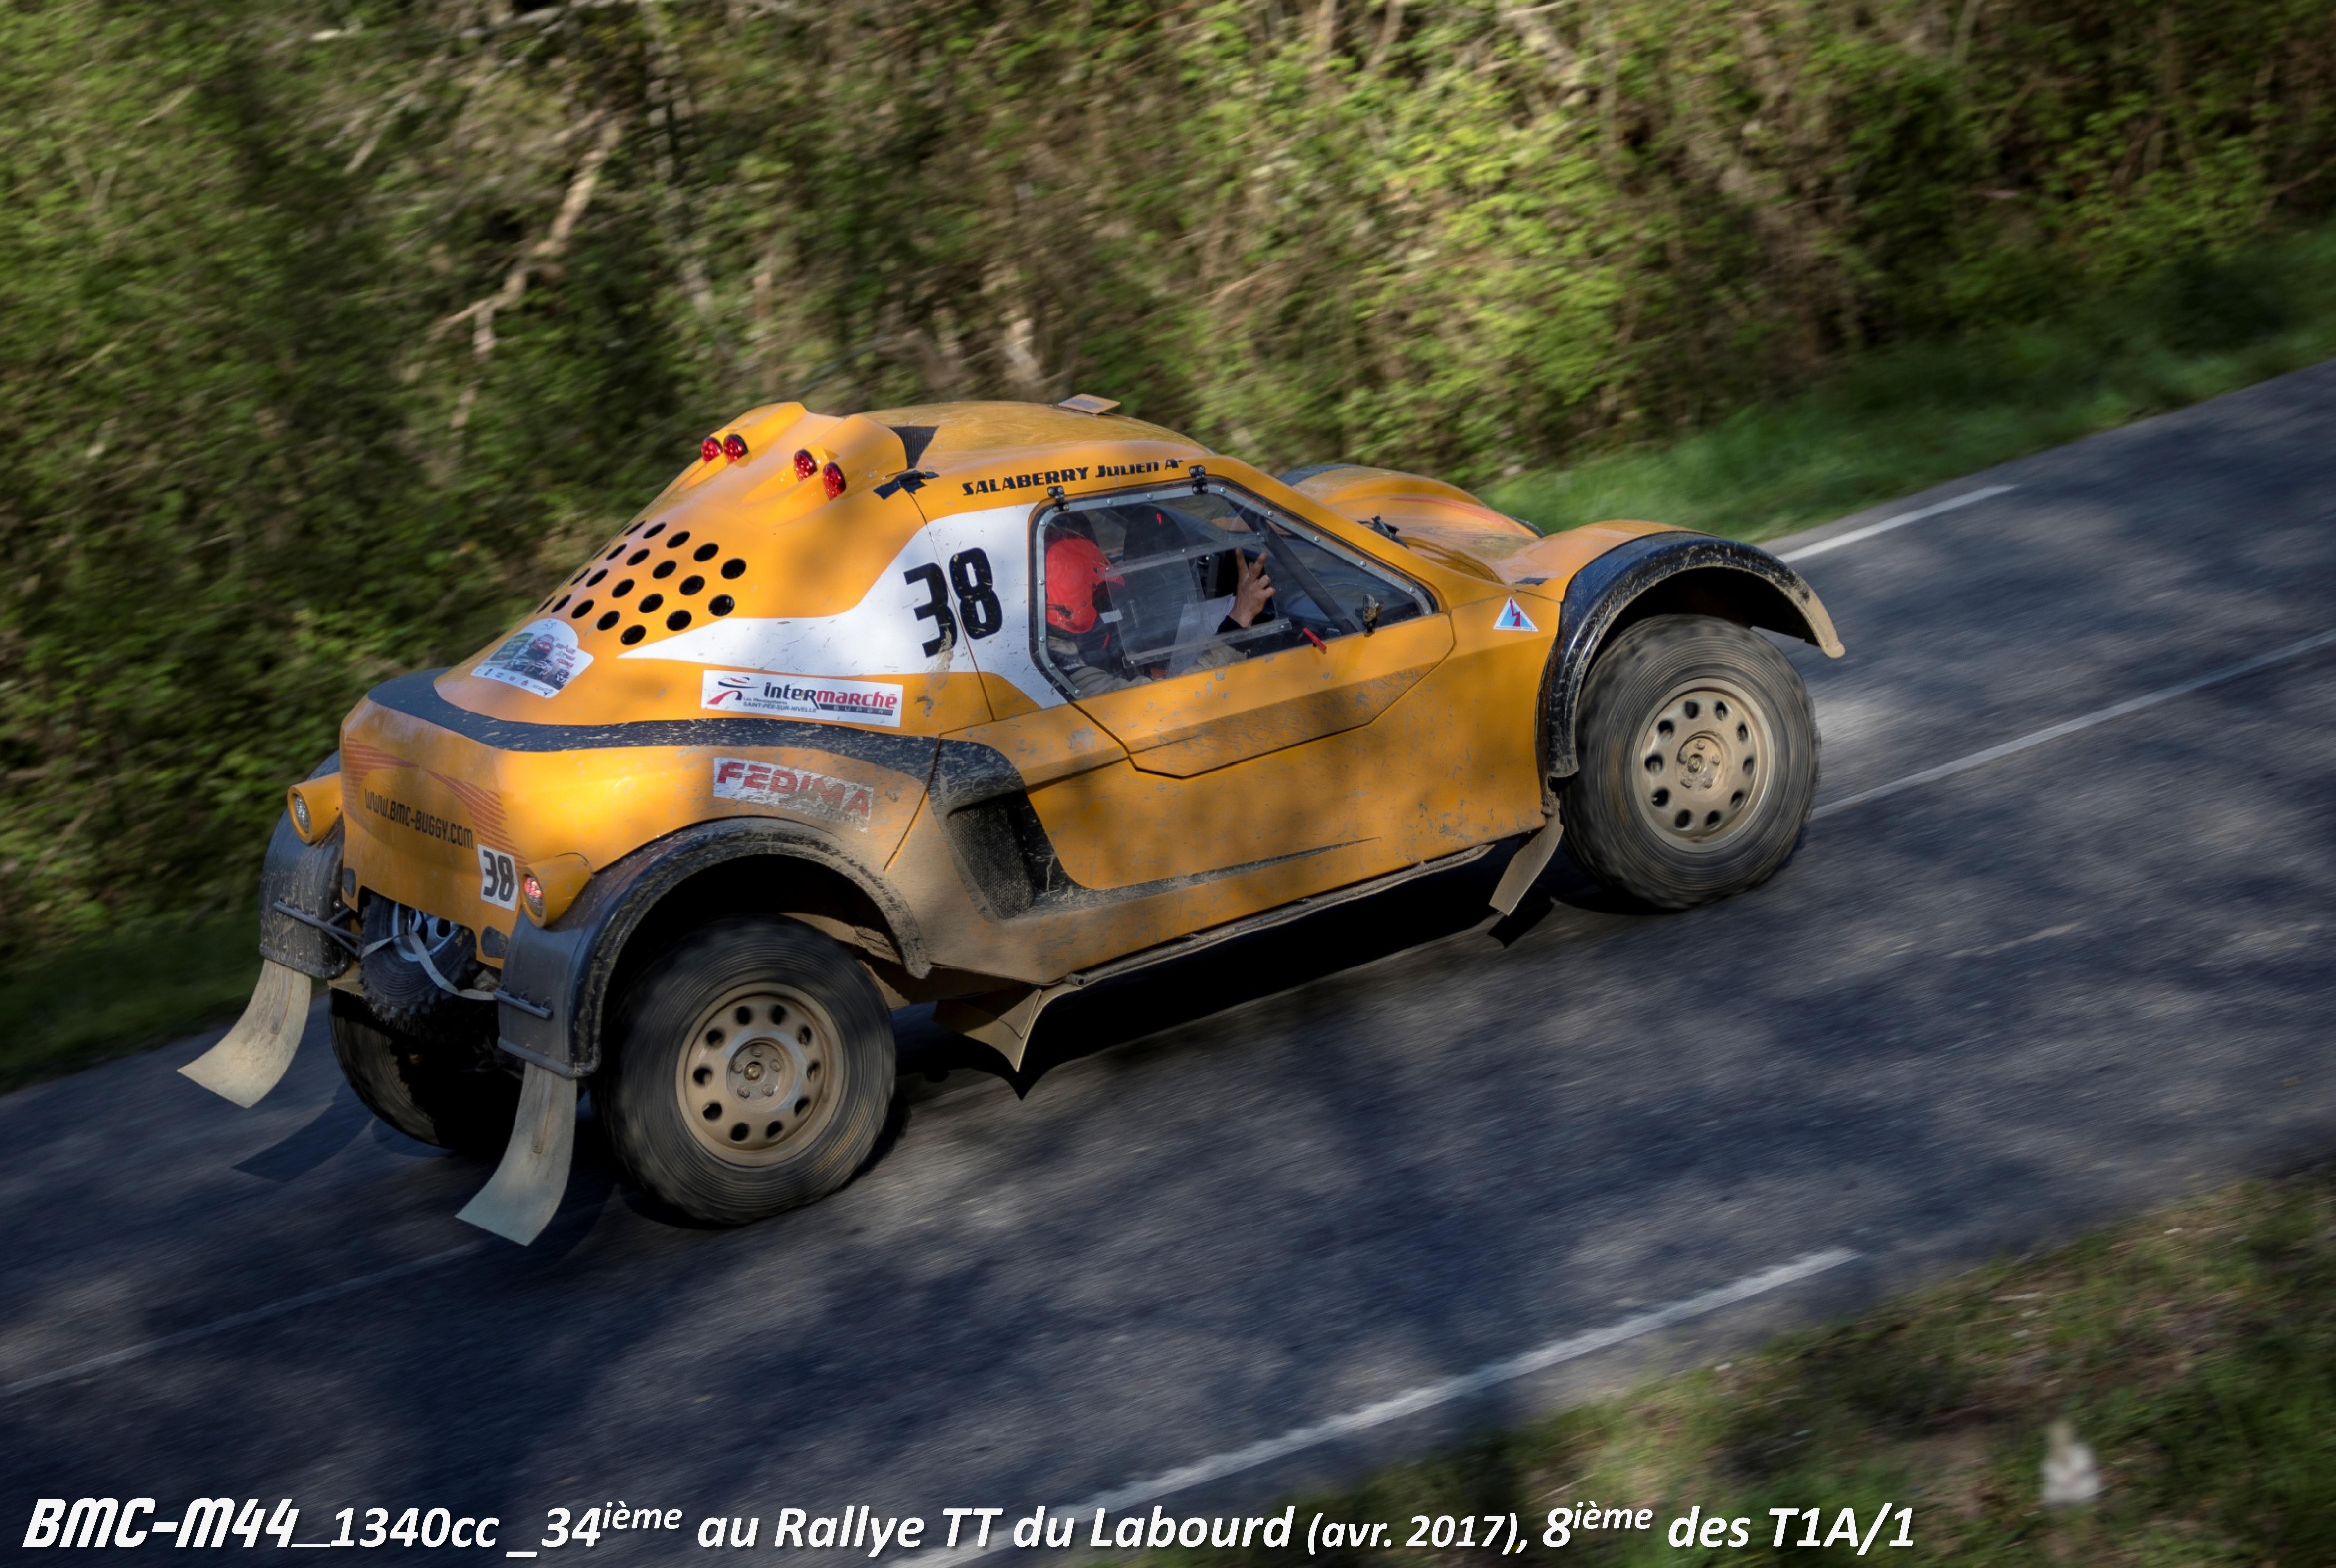 BMC-M44_Saison 2017_B. LAGARDERE - J. SALABERRY_ (2)